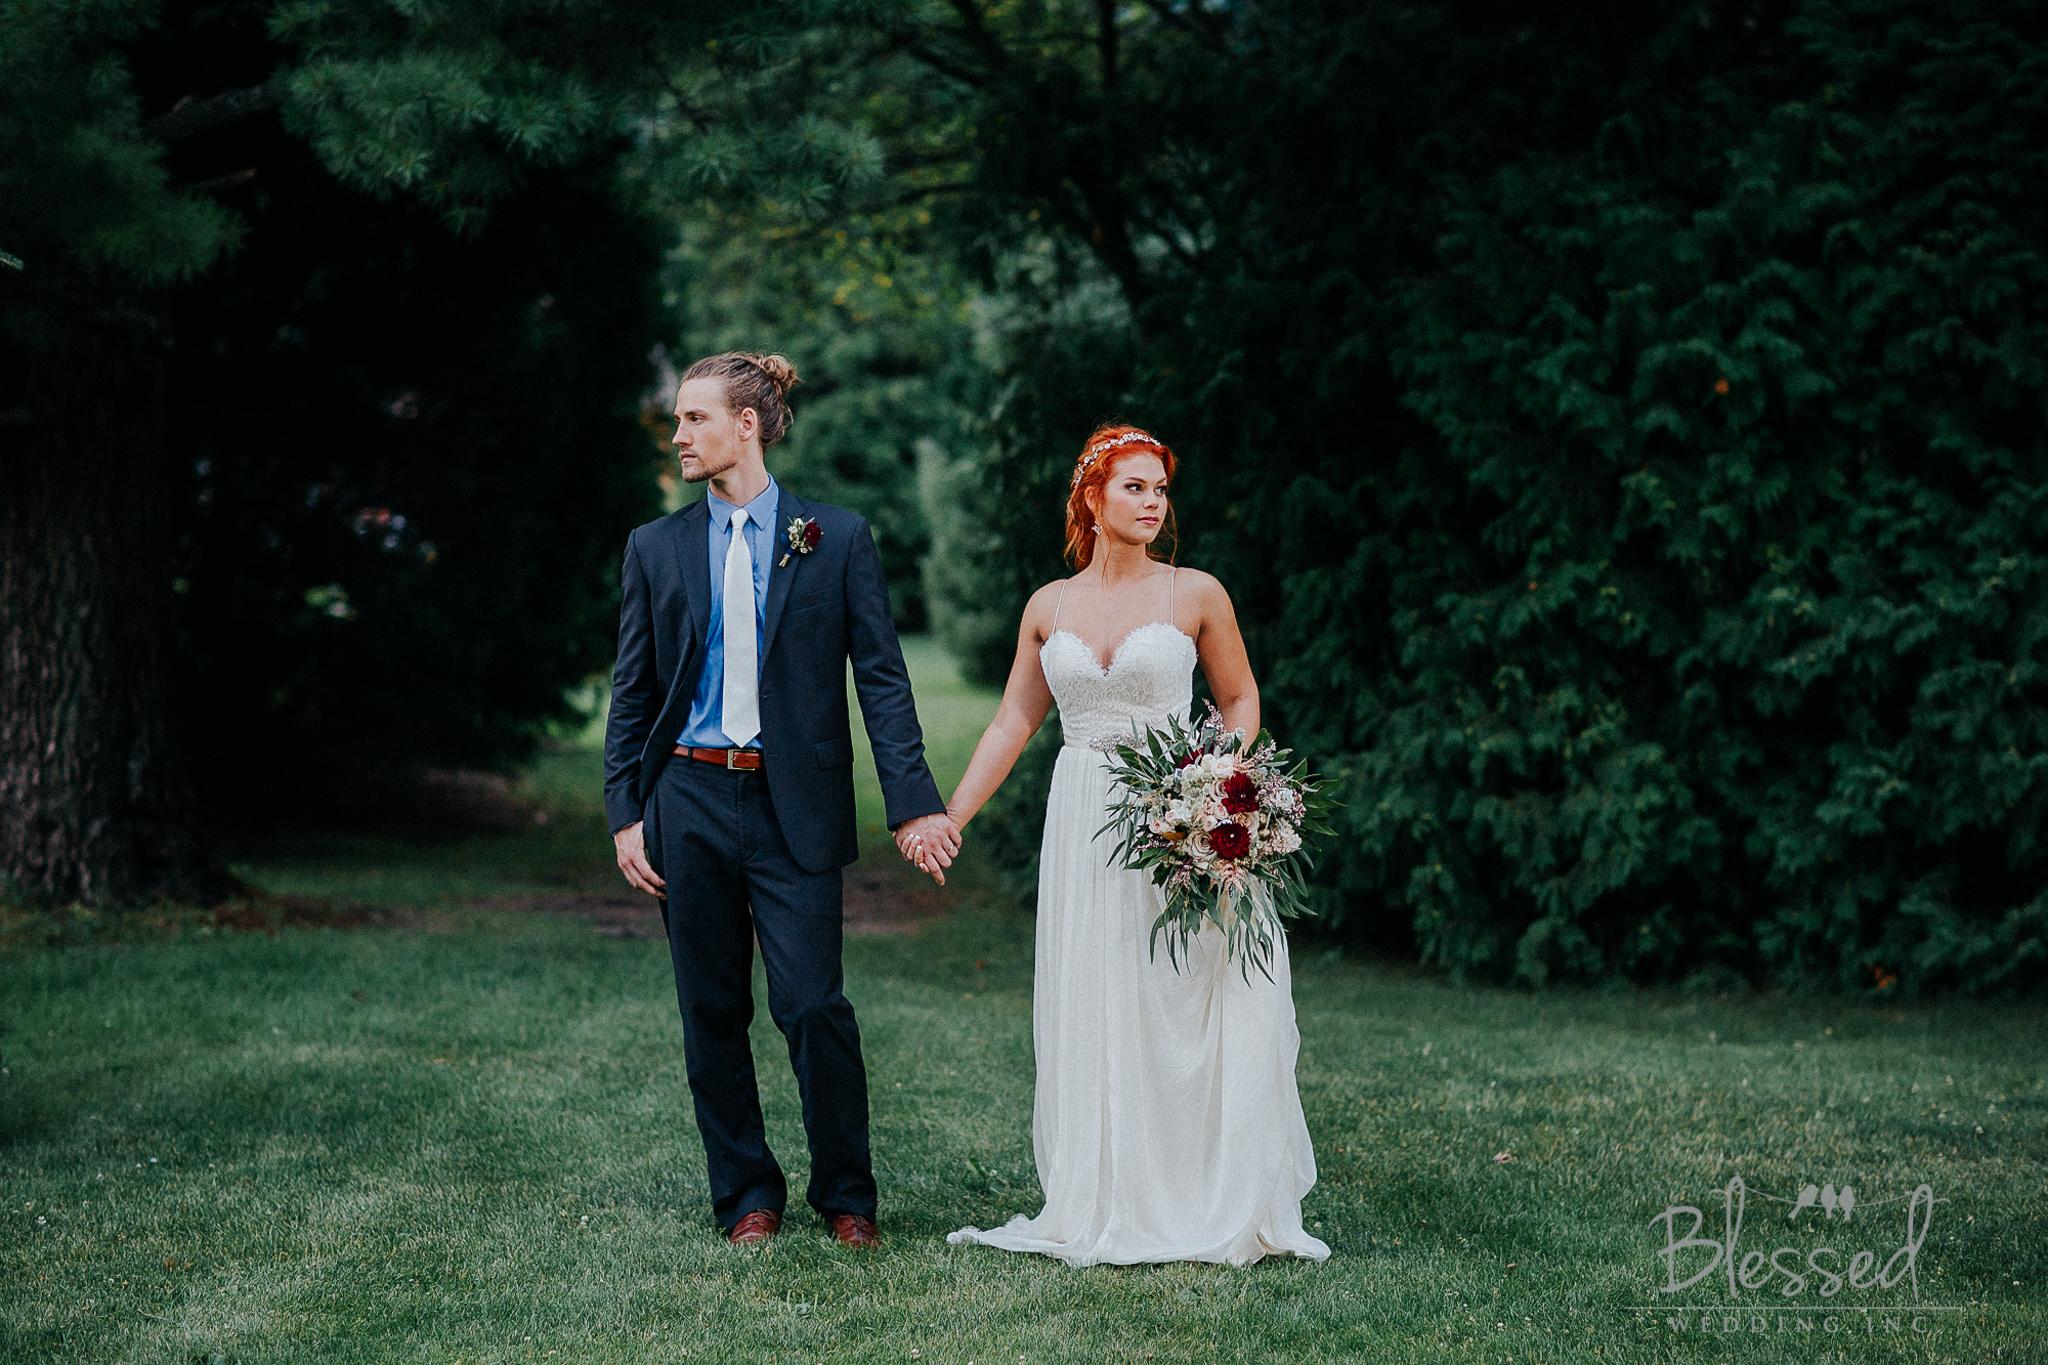 Destination Wedding Photography Minnesota By Blessed Wedding Photographers-50.jpg